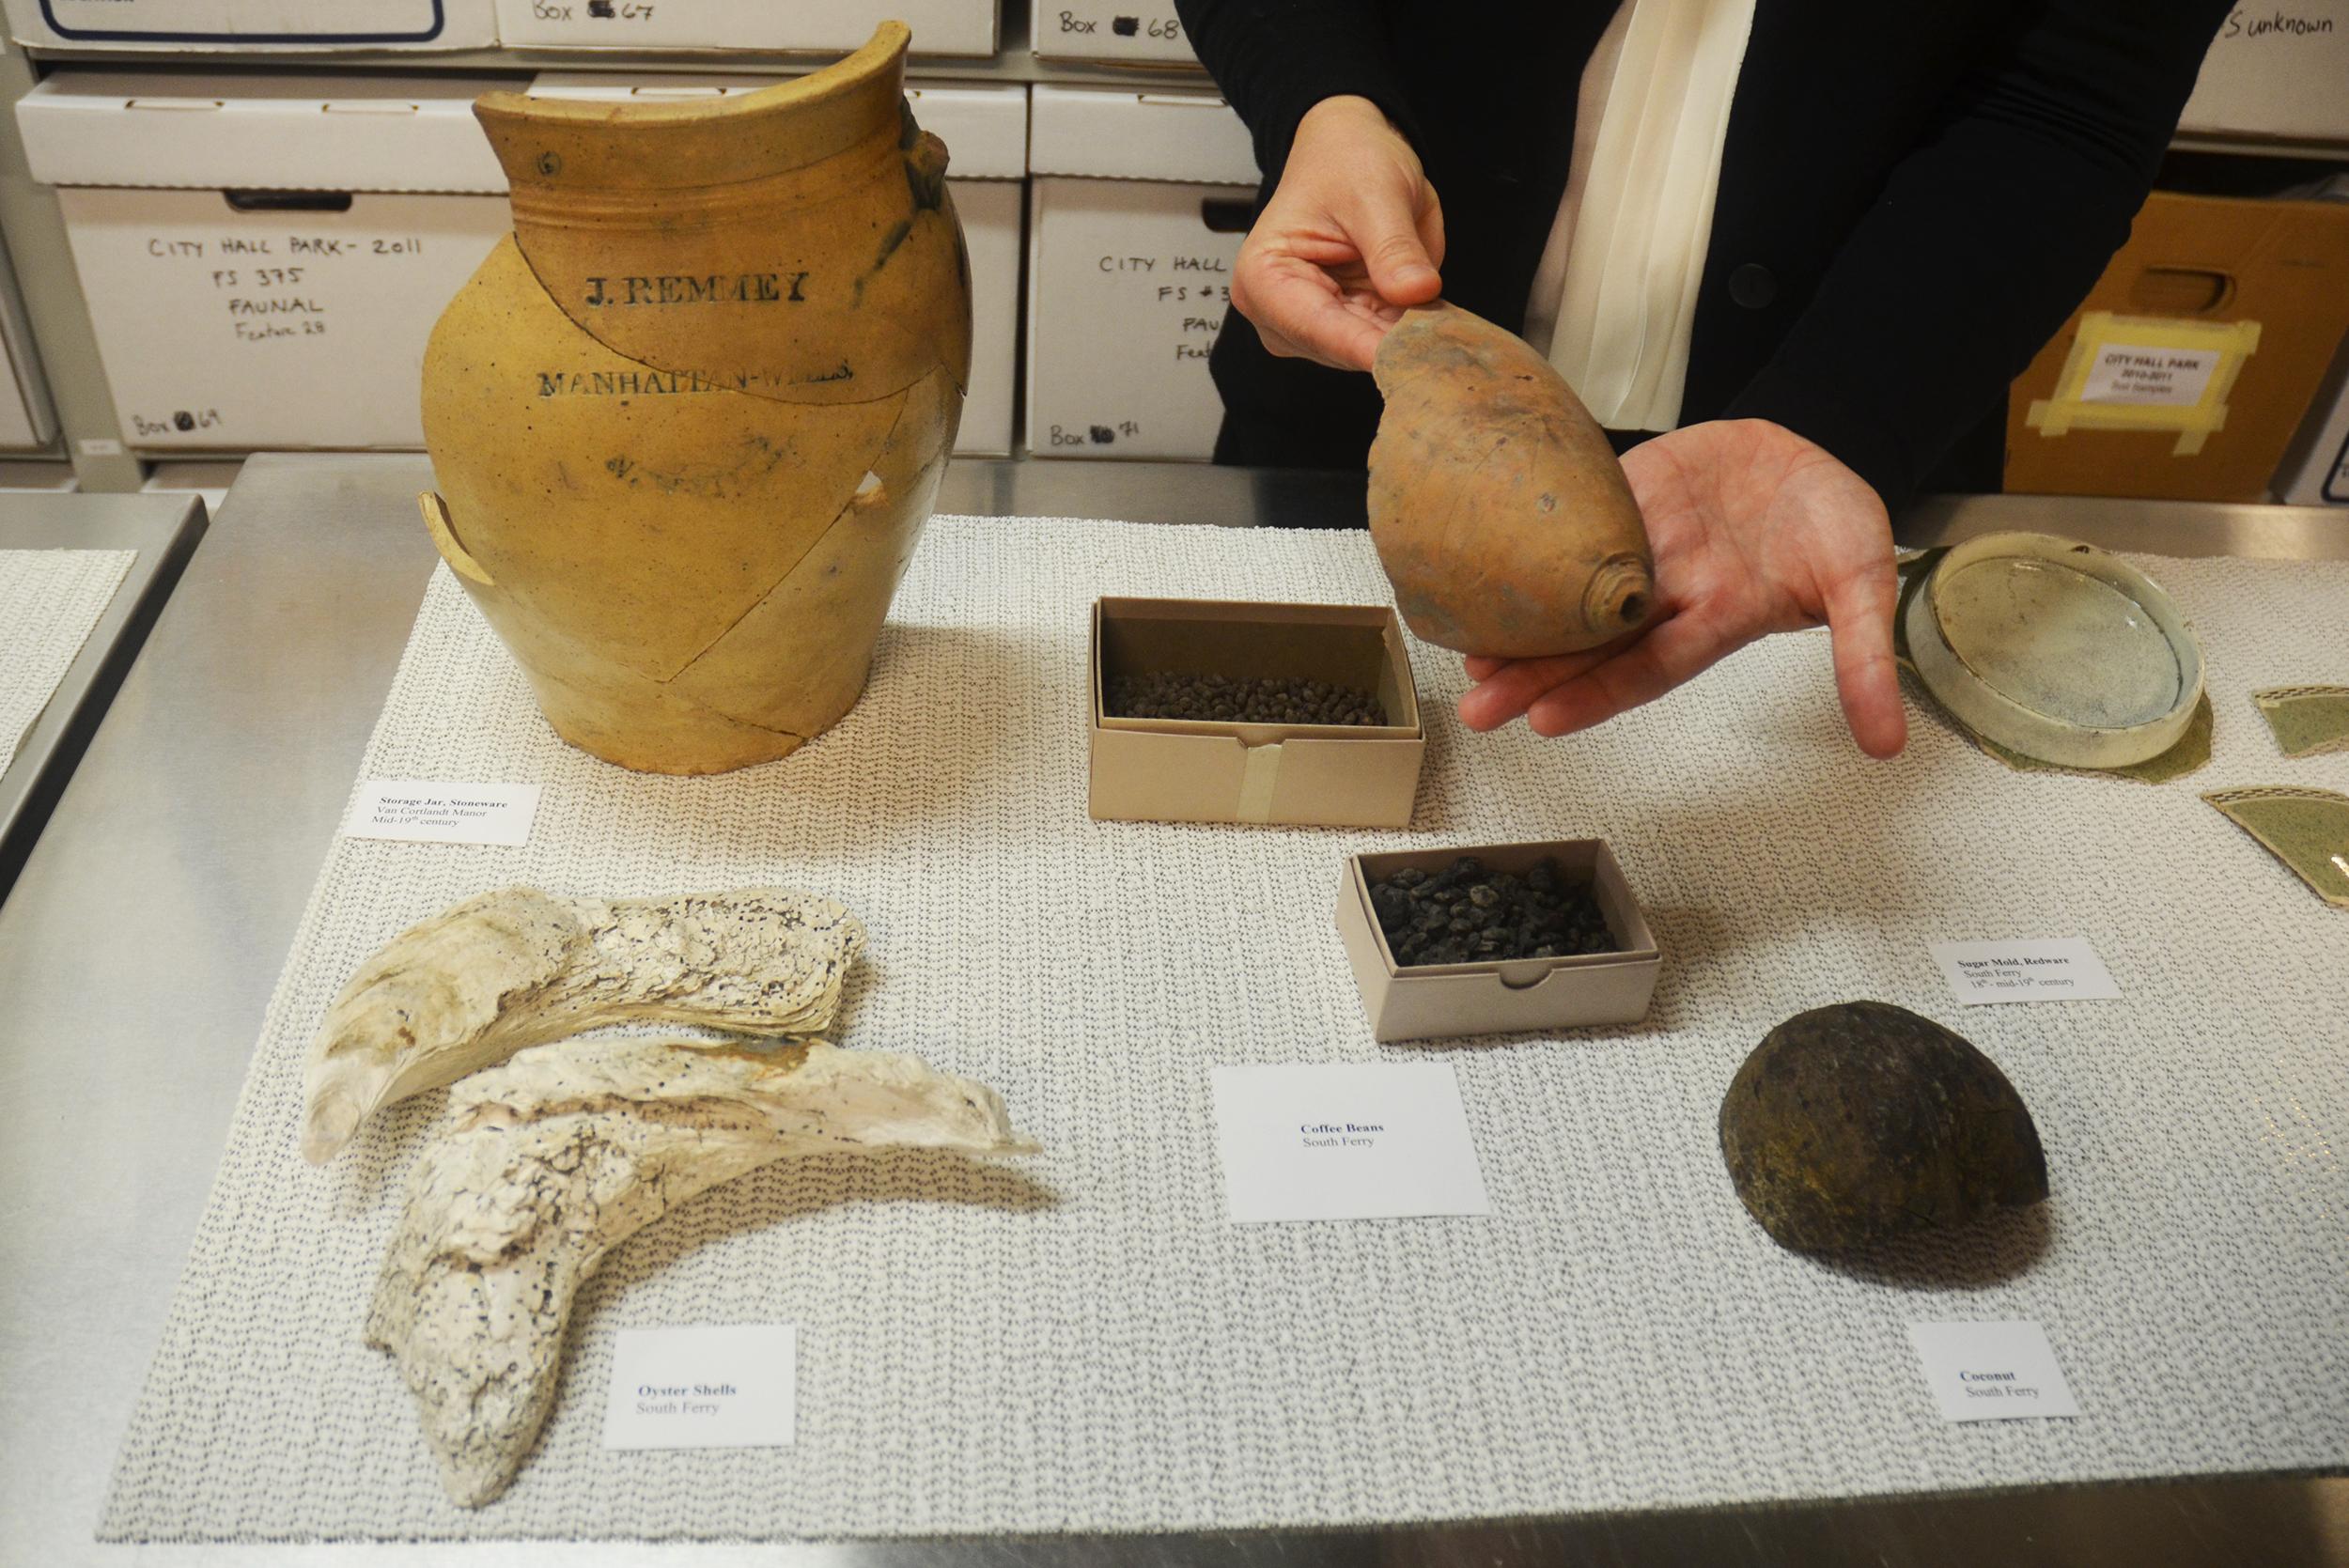 LPCArchaeologicalRepository_EvanBindelglass_20161005_07